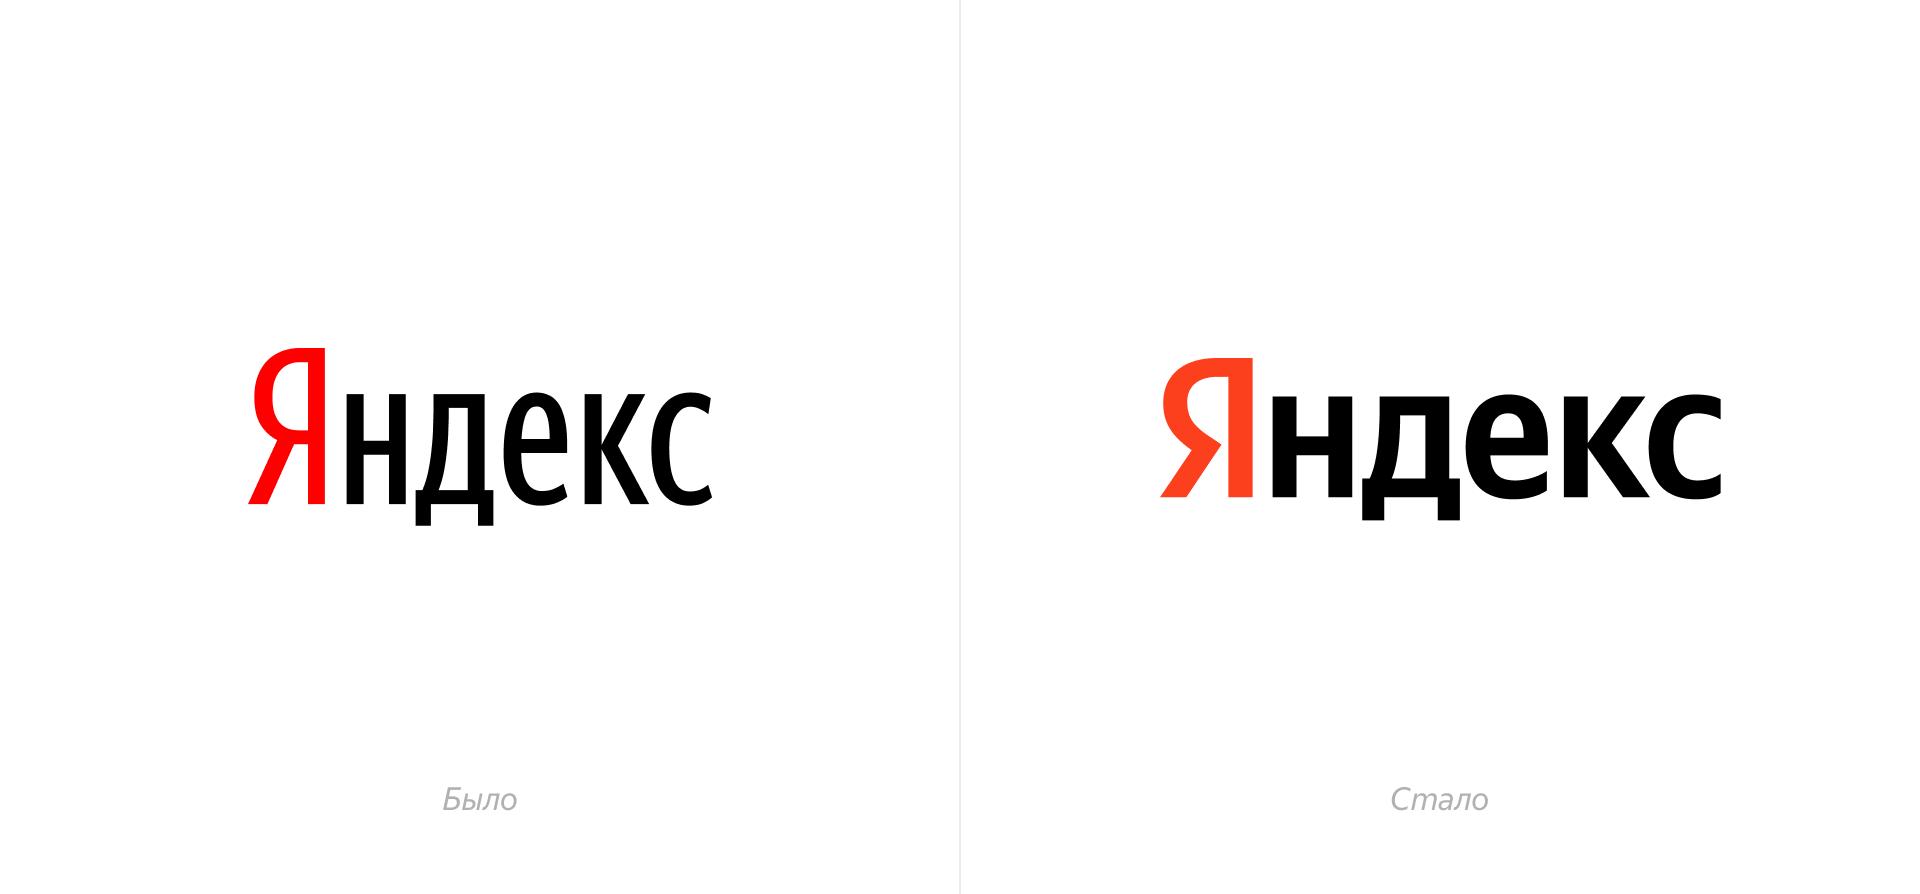 Yandex更换Logo